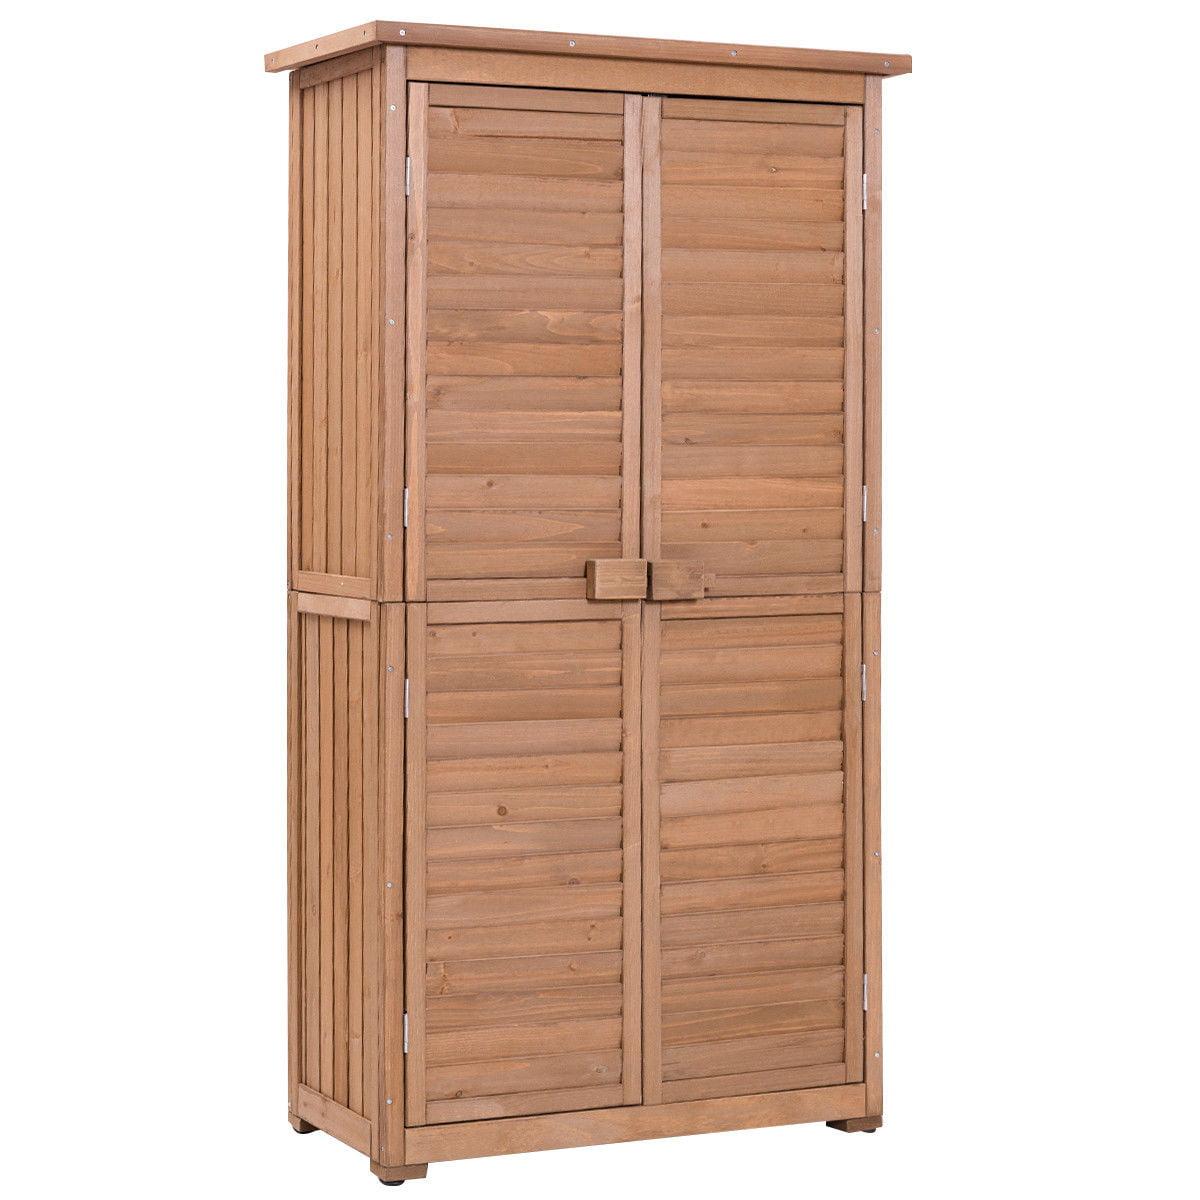 "GHP 63""x18.1""x33.1"" Fir Wood Brown Garden Shed Cabinet with Black Asphalt Roof"